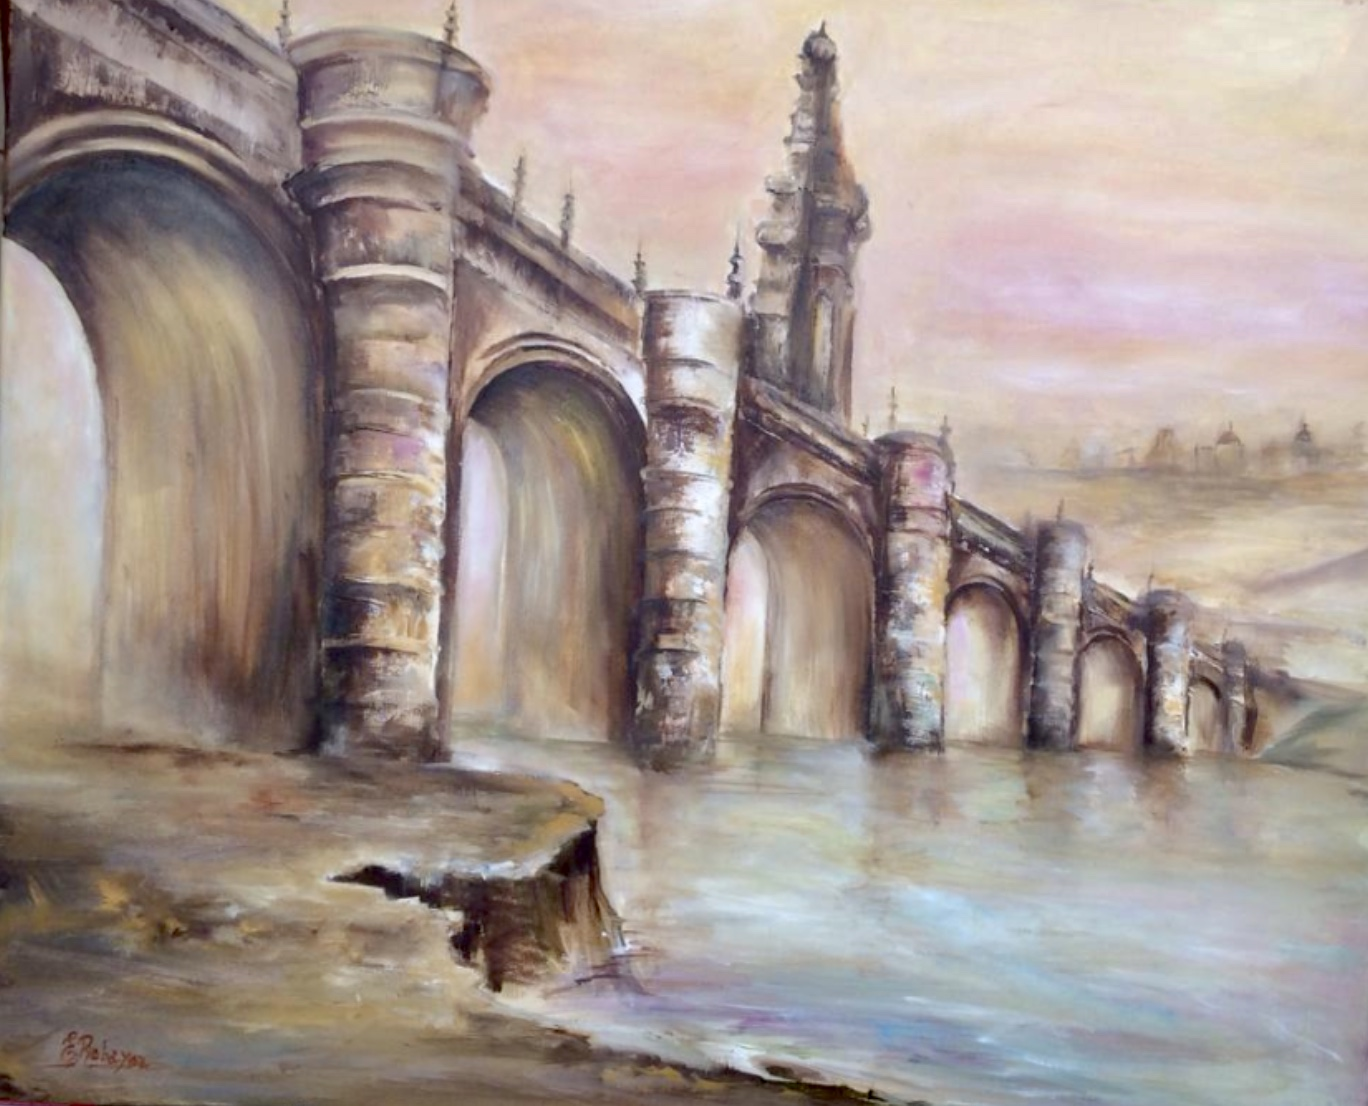 Puente de Toledo (2015) - Elena Robayna Abreut